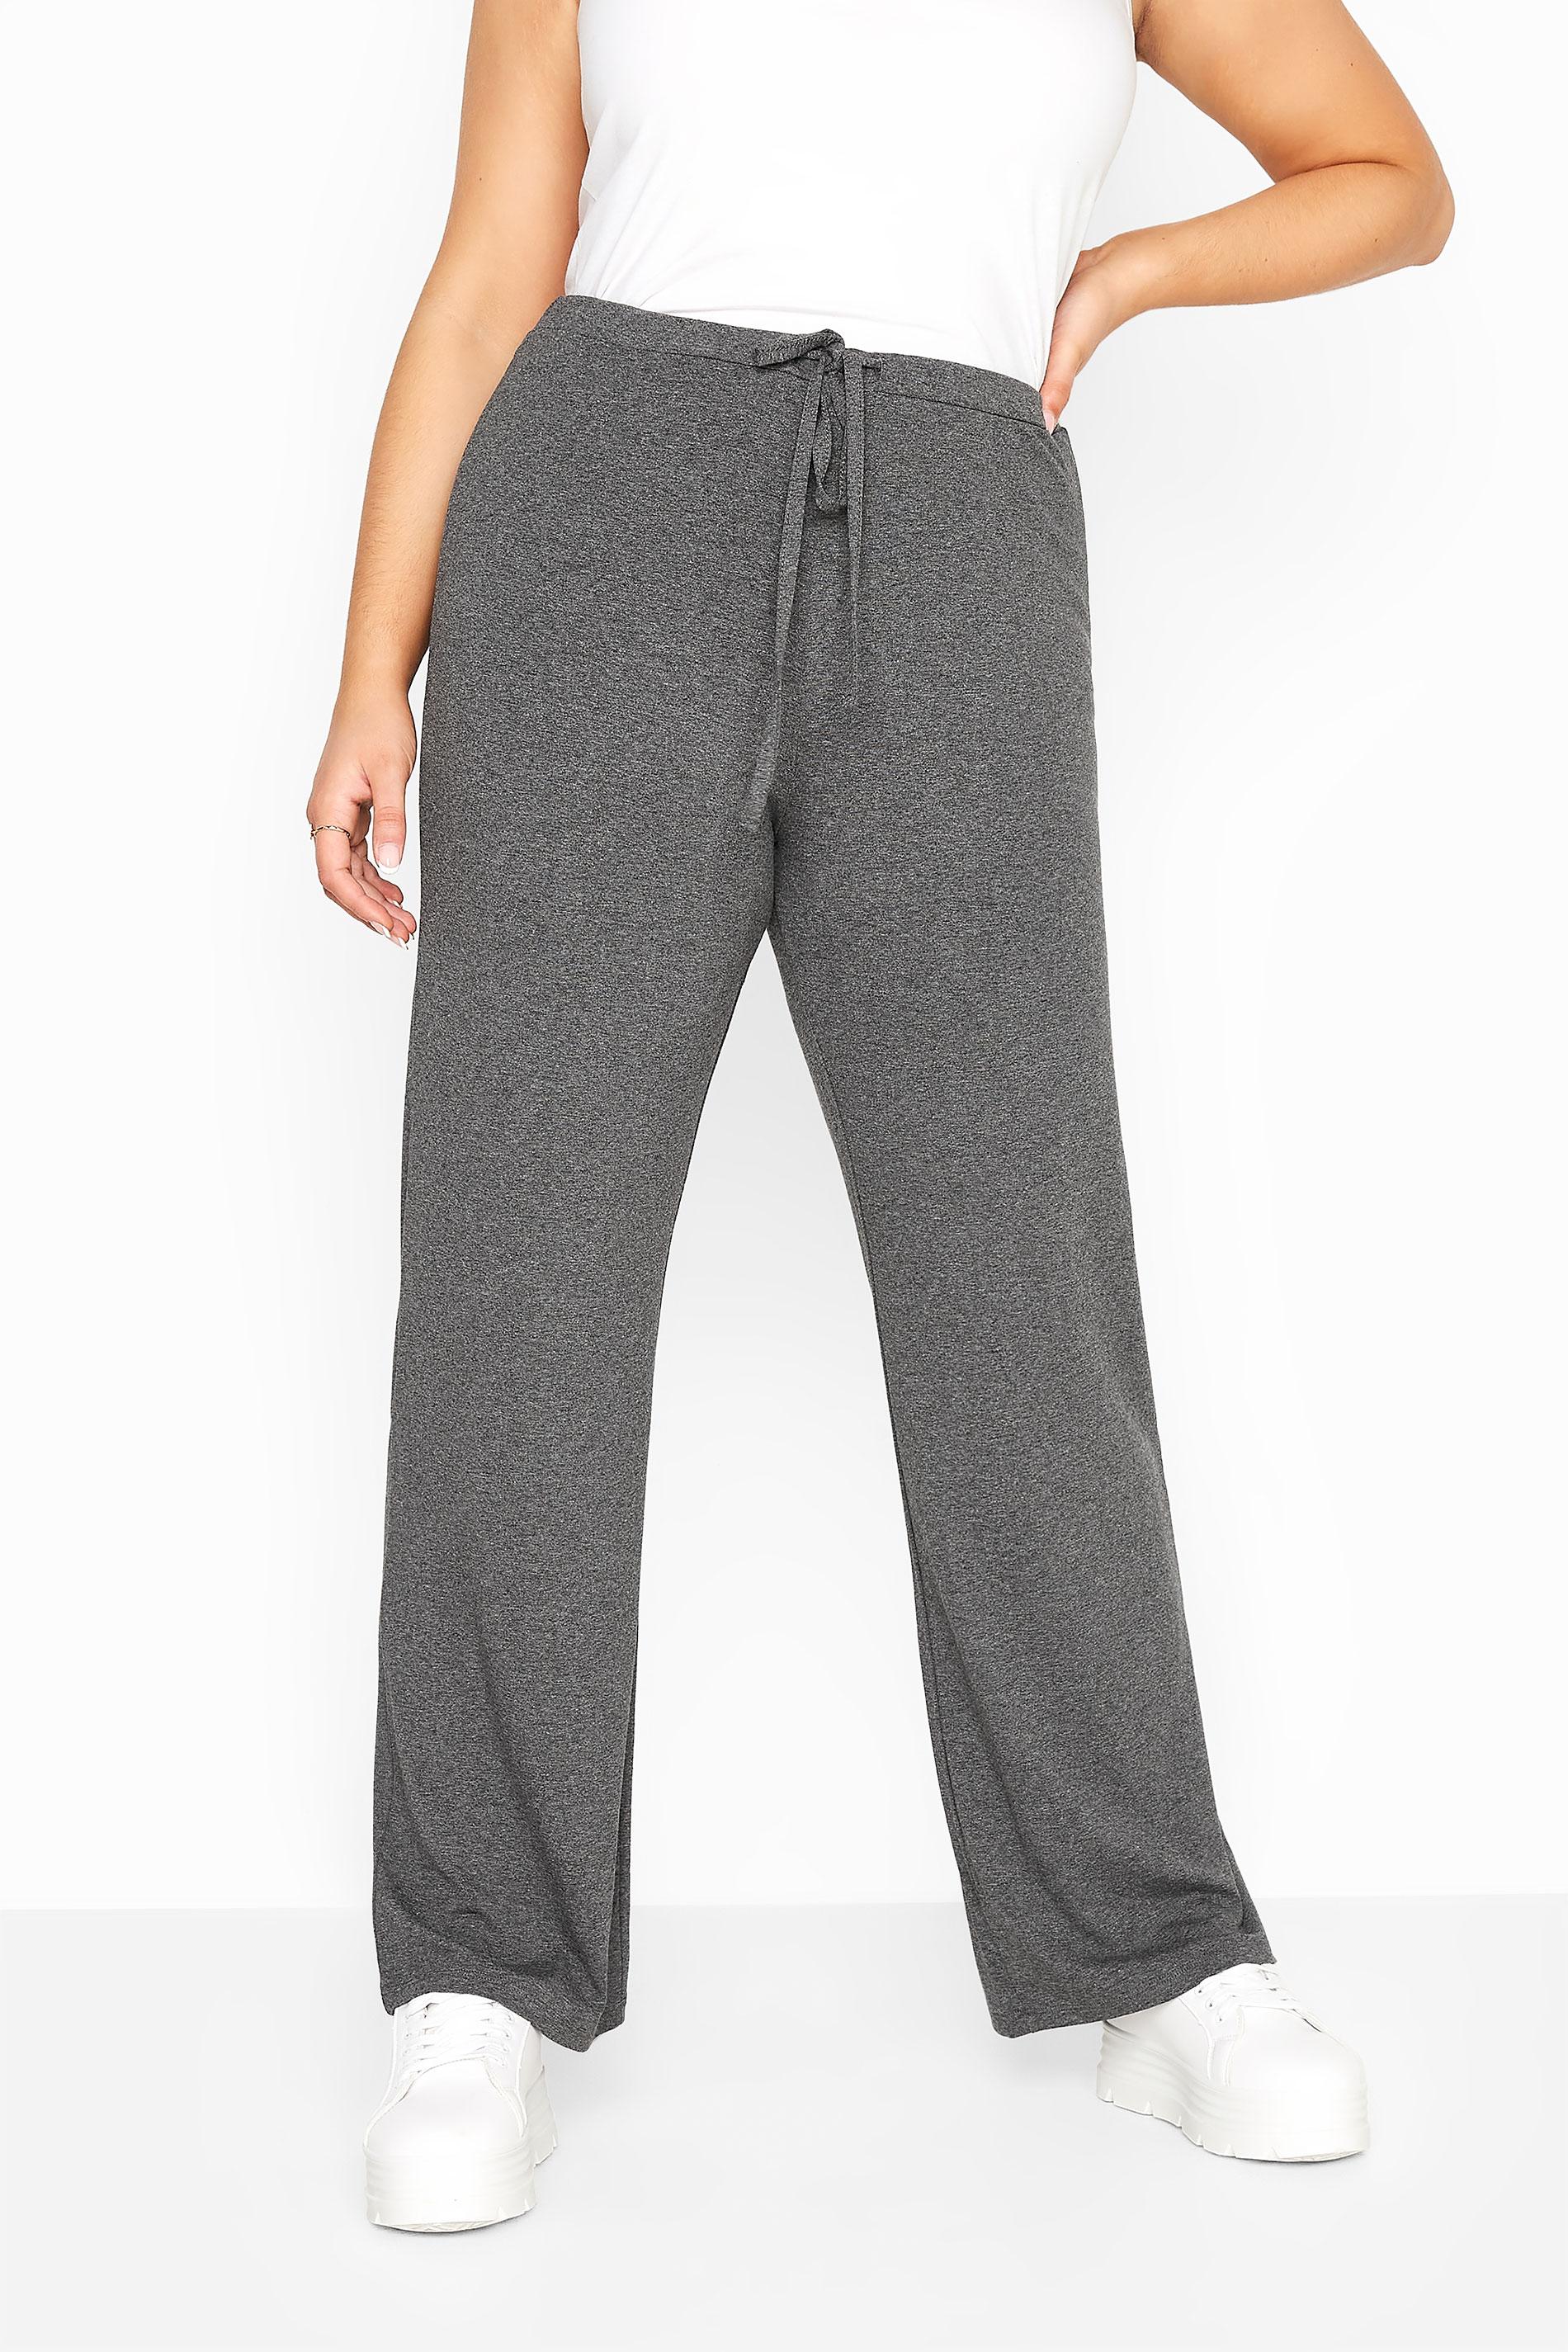 Charcoal Grey Wide Leg Pull On Stretch Jersey Yoga Pants_B.jpg